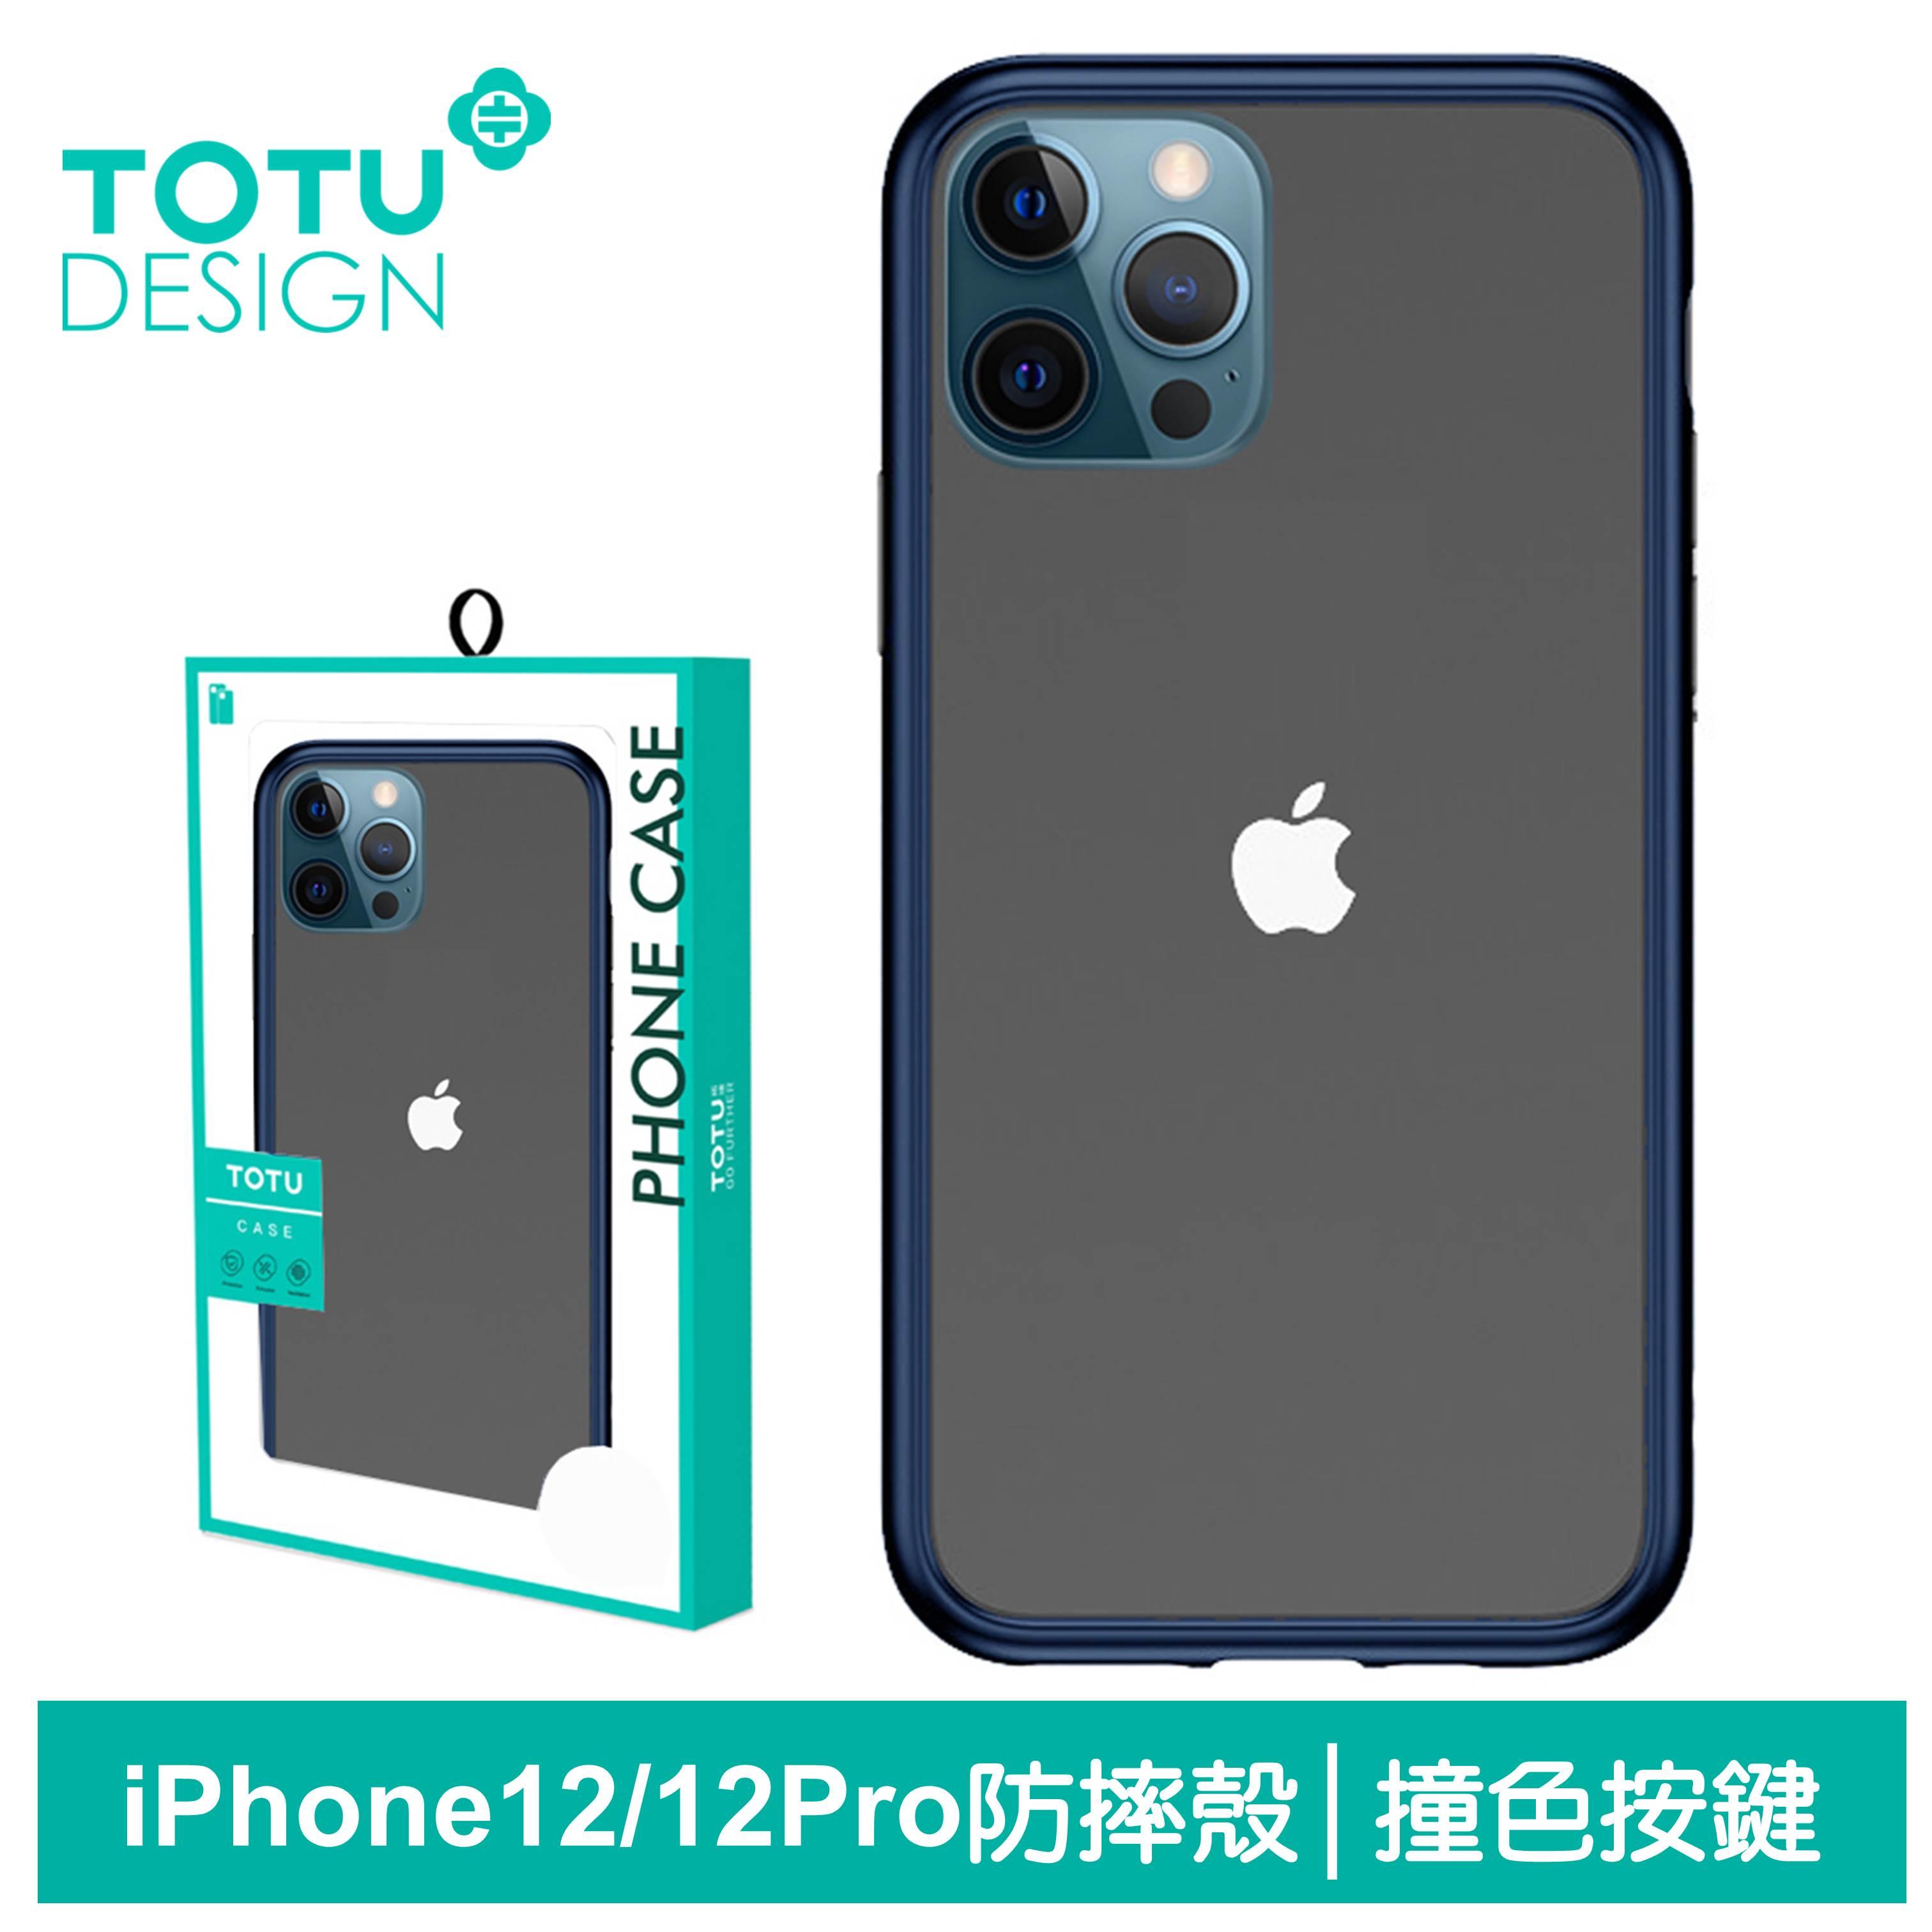 TOTU台灣官方 iPhone 12 / 12 Pro 手機殼 i12 Pro 保護殼 6.1吋 防摔殼 撞色按鍵 晶剛系列 藍色